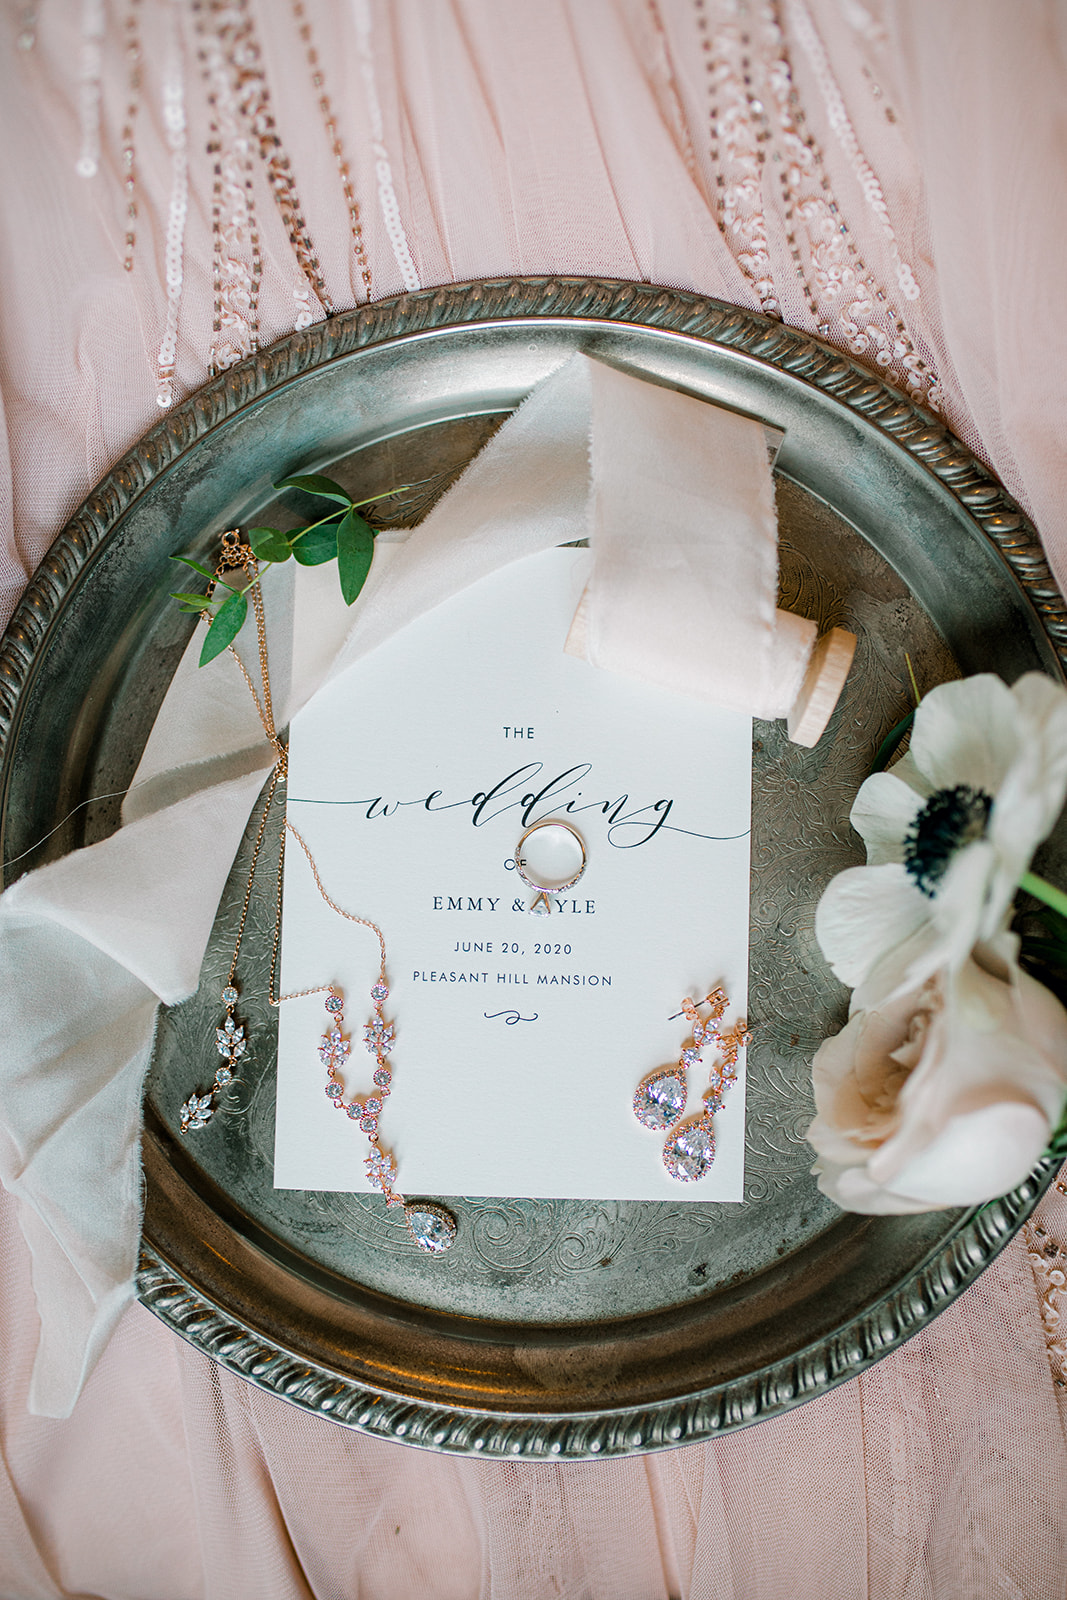 Black and white wedding stationery design | Nashville Bride Guide